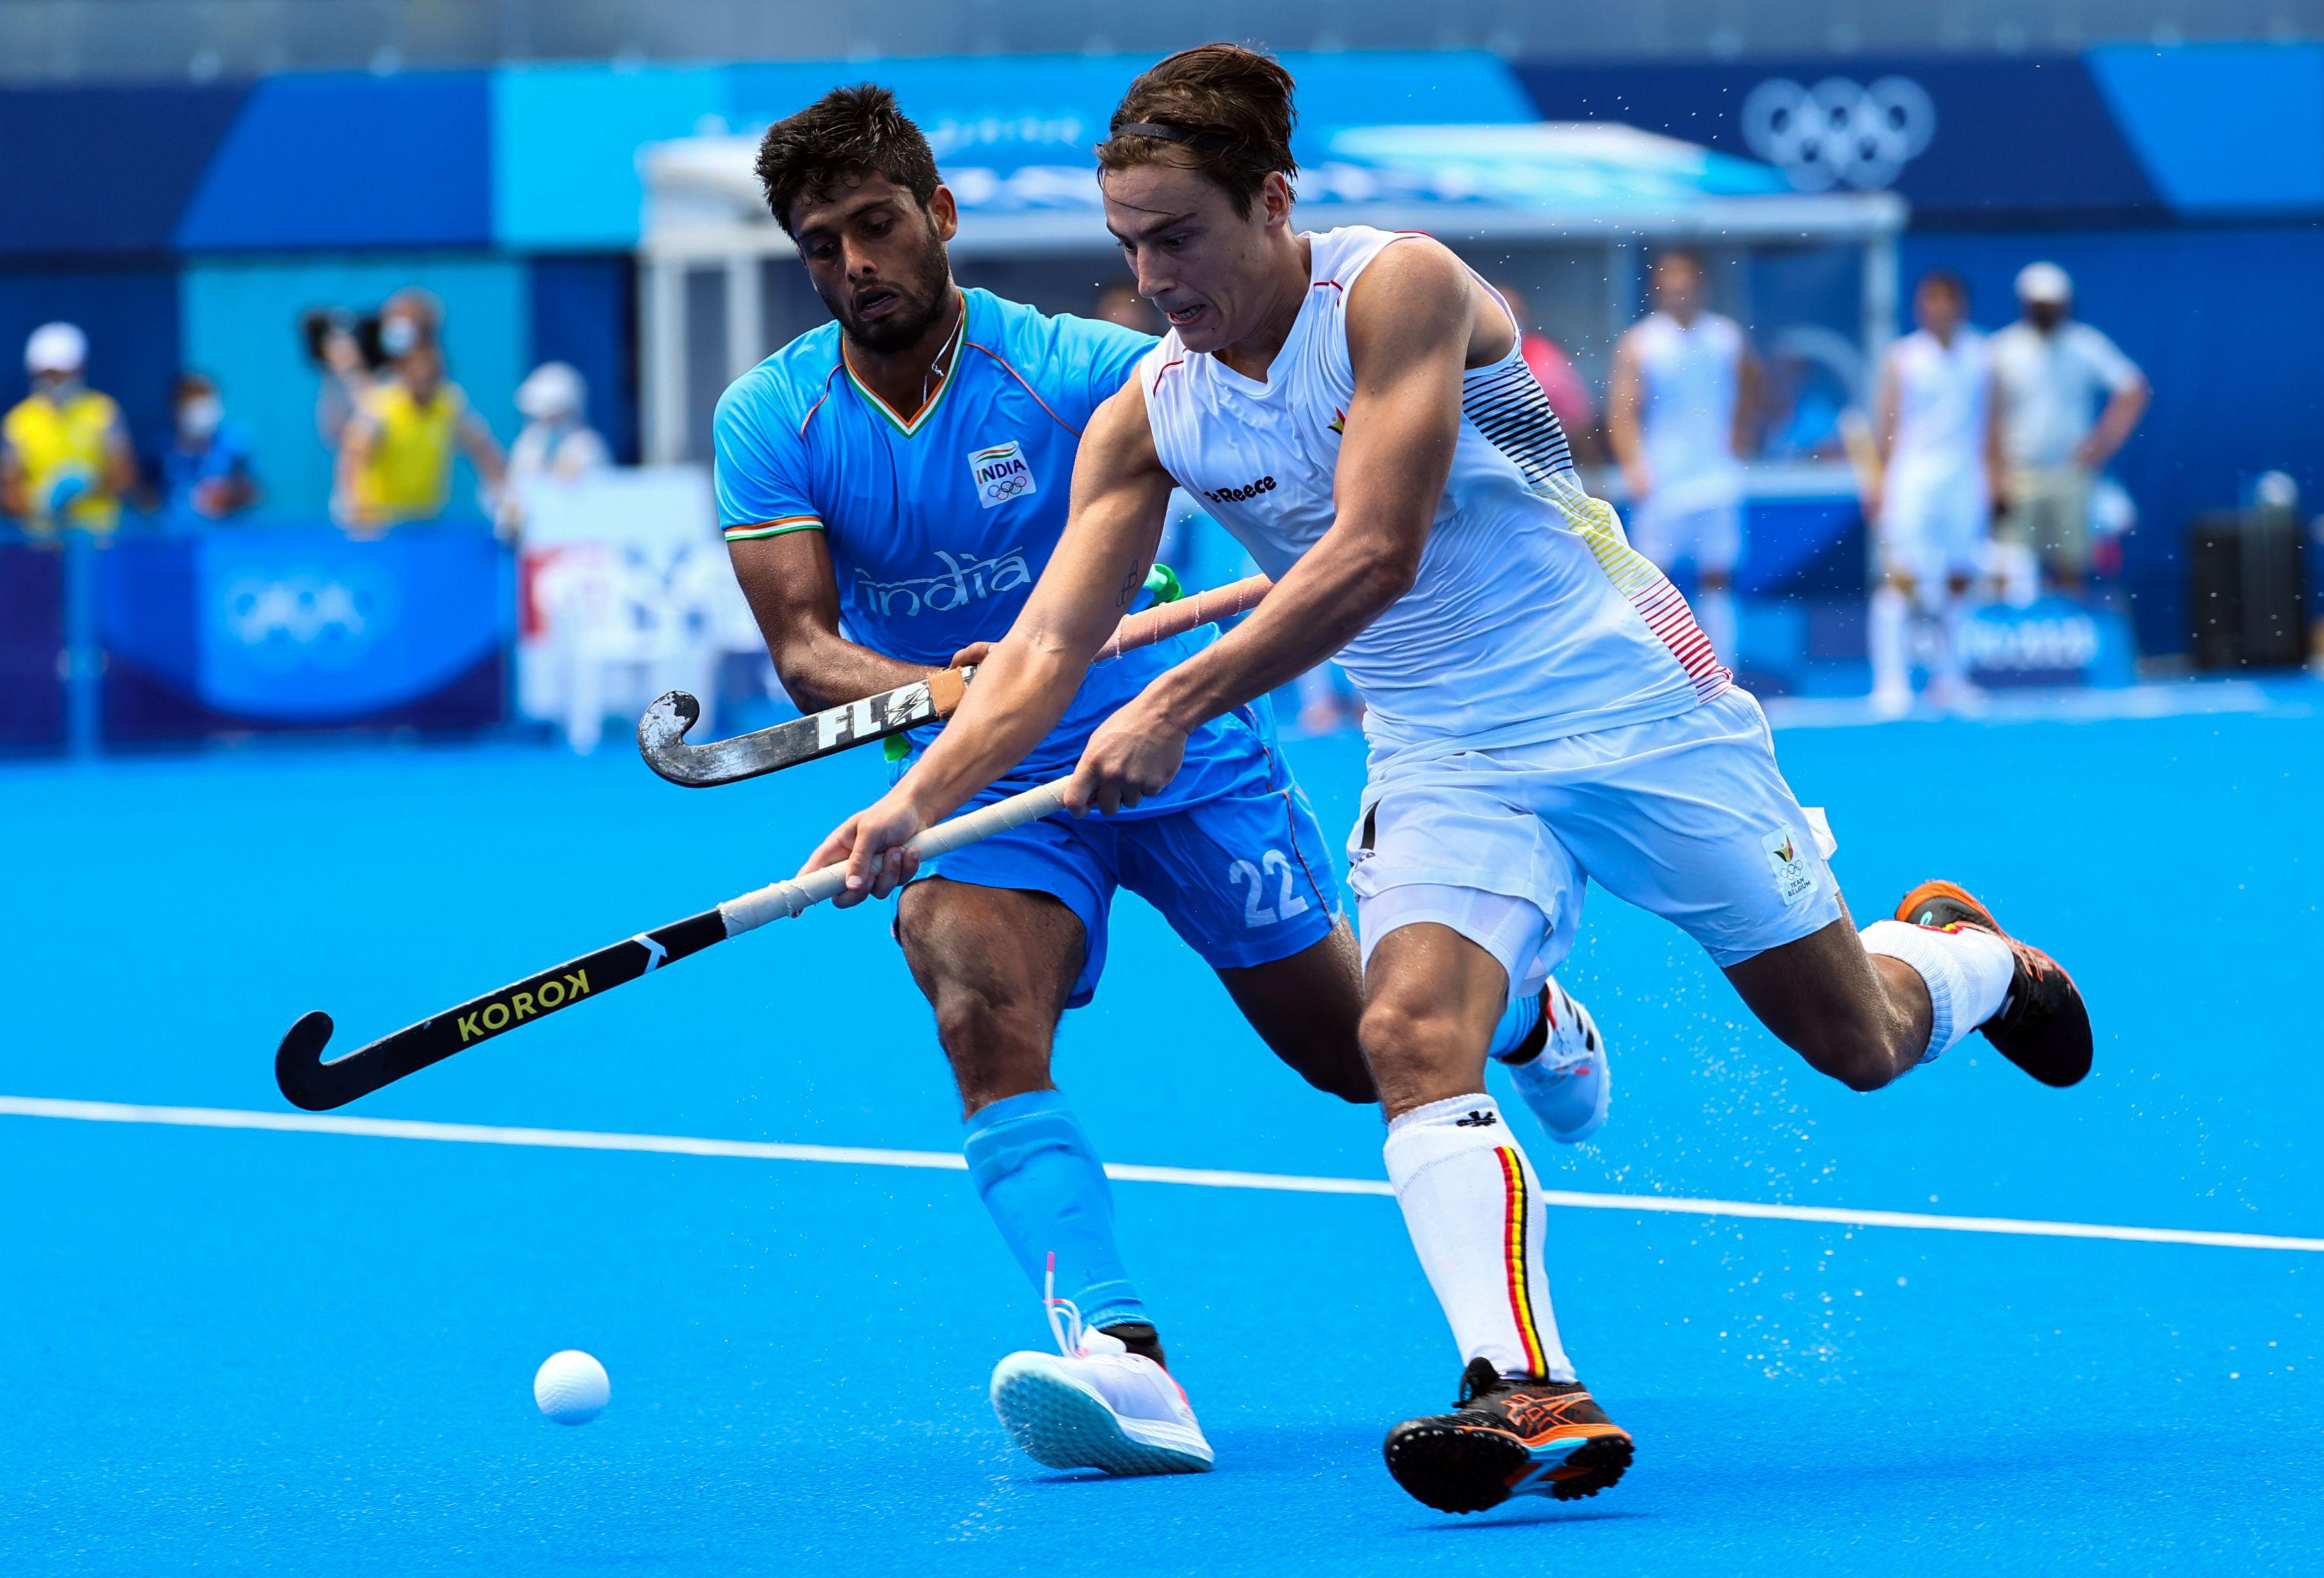 Tokyo 2020 Olympics - Hockey - Men - Semifinal - India v Belgium - Oi Hockey Stadium, Tokyo, Japan - August 3, 2021. Thomas Briels of Belgium in action against Varun Kumar of India. REUTERS/Bernadett Szabo